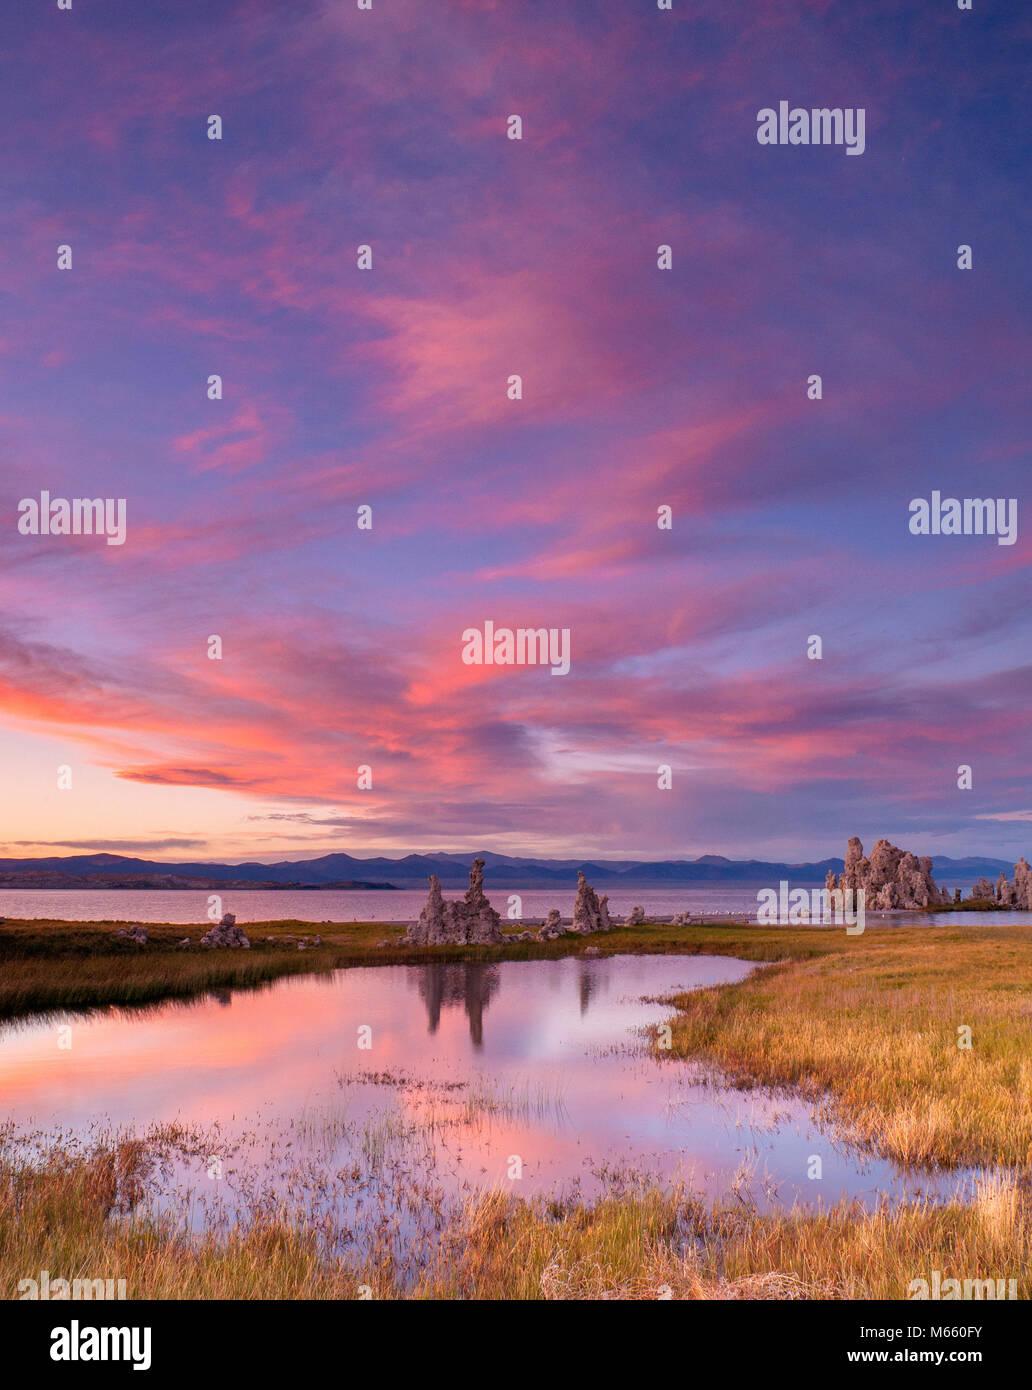 Sunset,  Wetlands, Tufa Formations, Mono Lake, Mono Basin NF Scenic Area, Inyo NF, CA - Stock Image